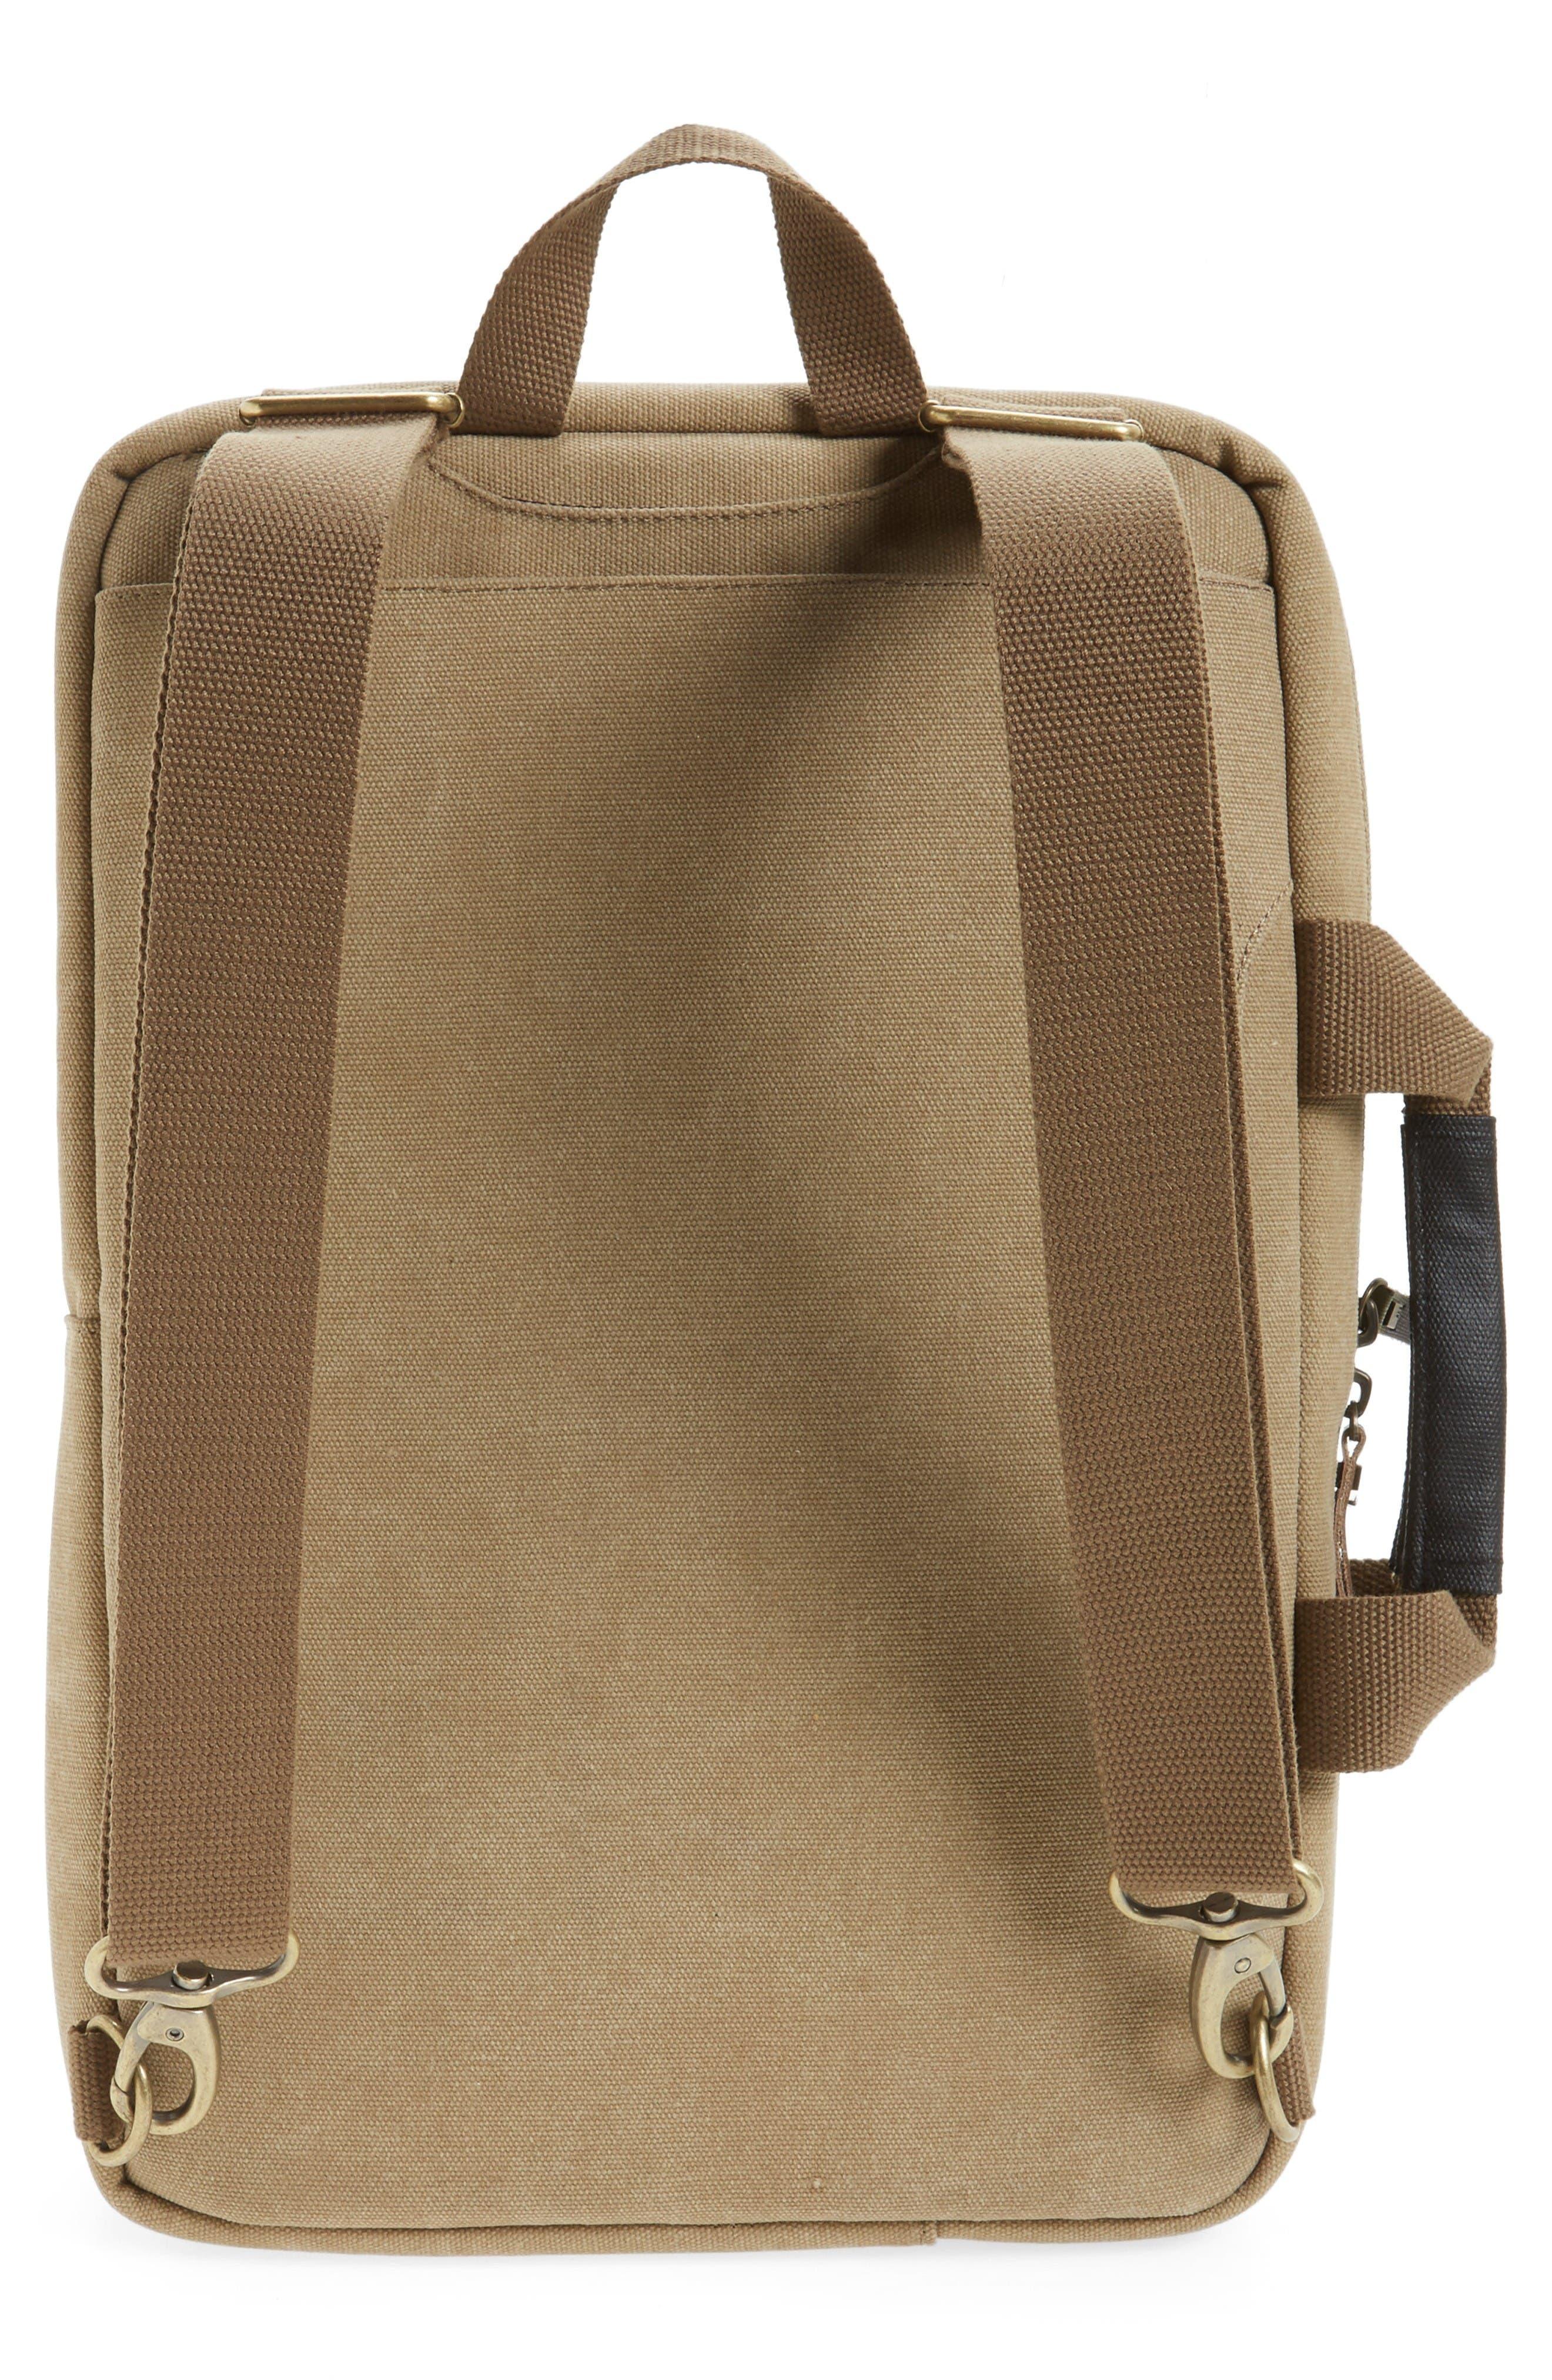 Radar Convertible Water Resistant Briefcase,                             Alternate thumbnail 3, color,                             Khaki